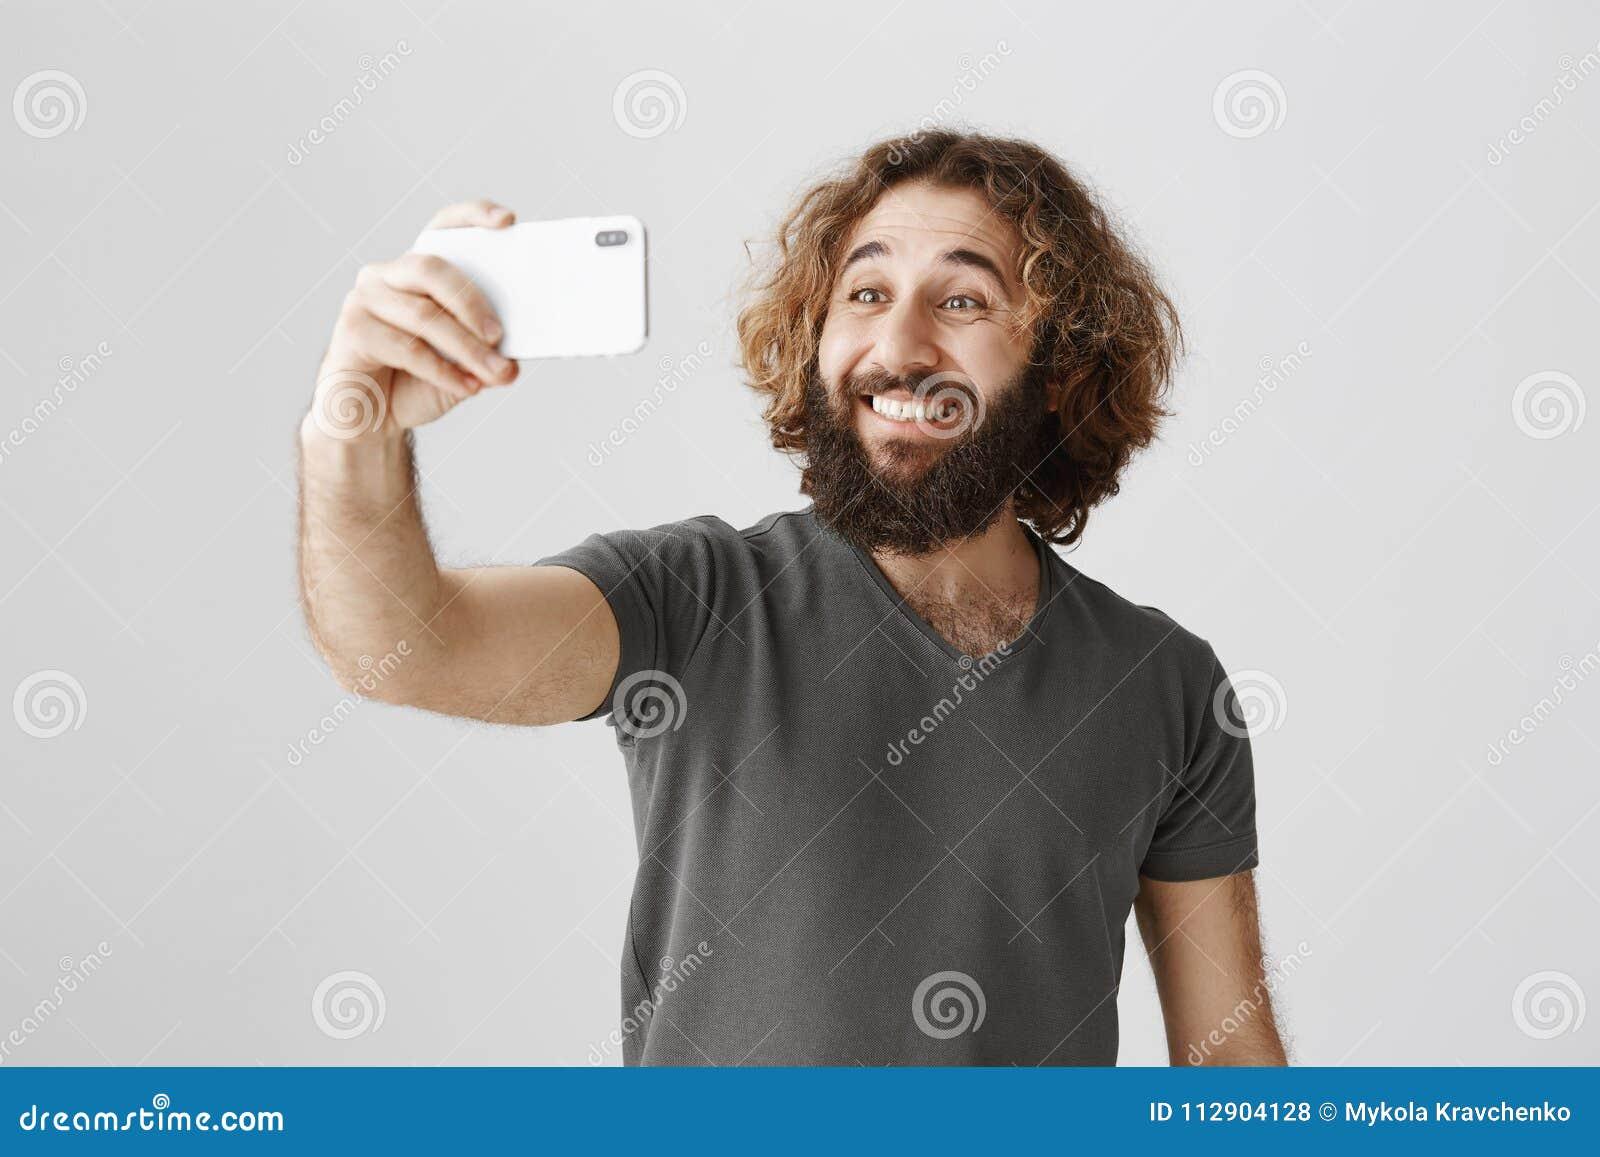 Selfie guy good looking How to